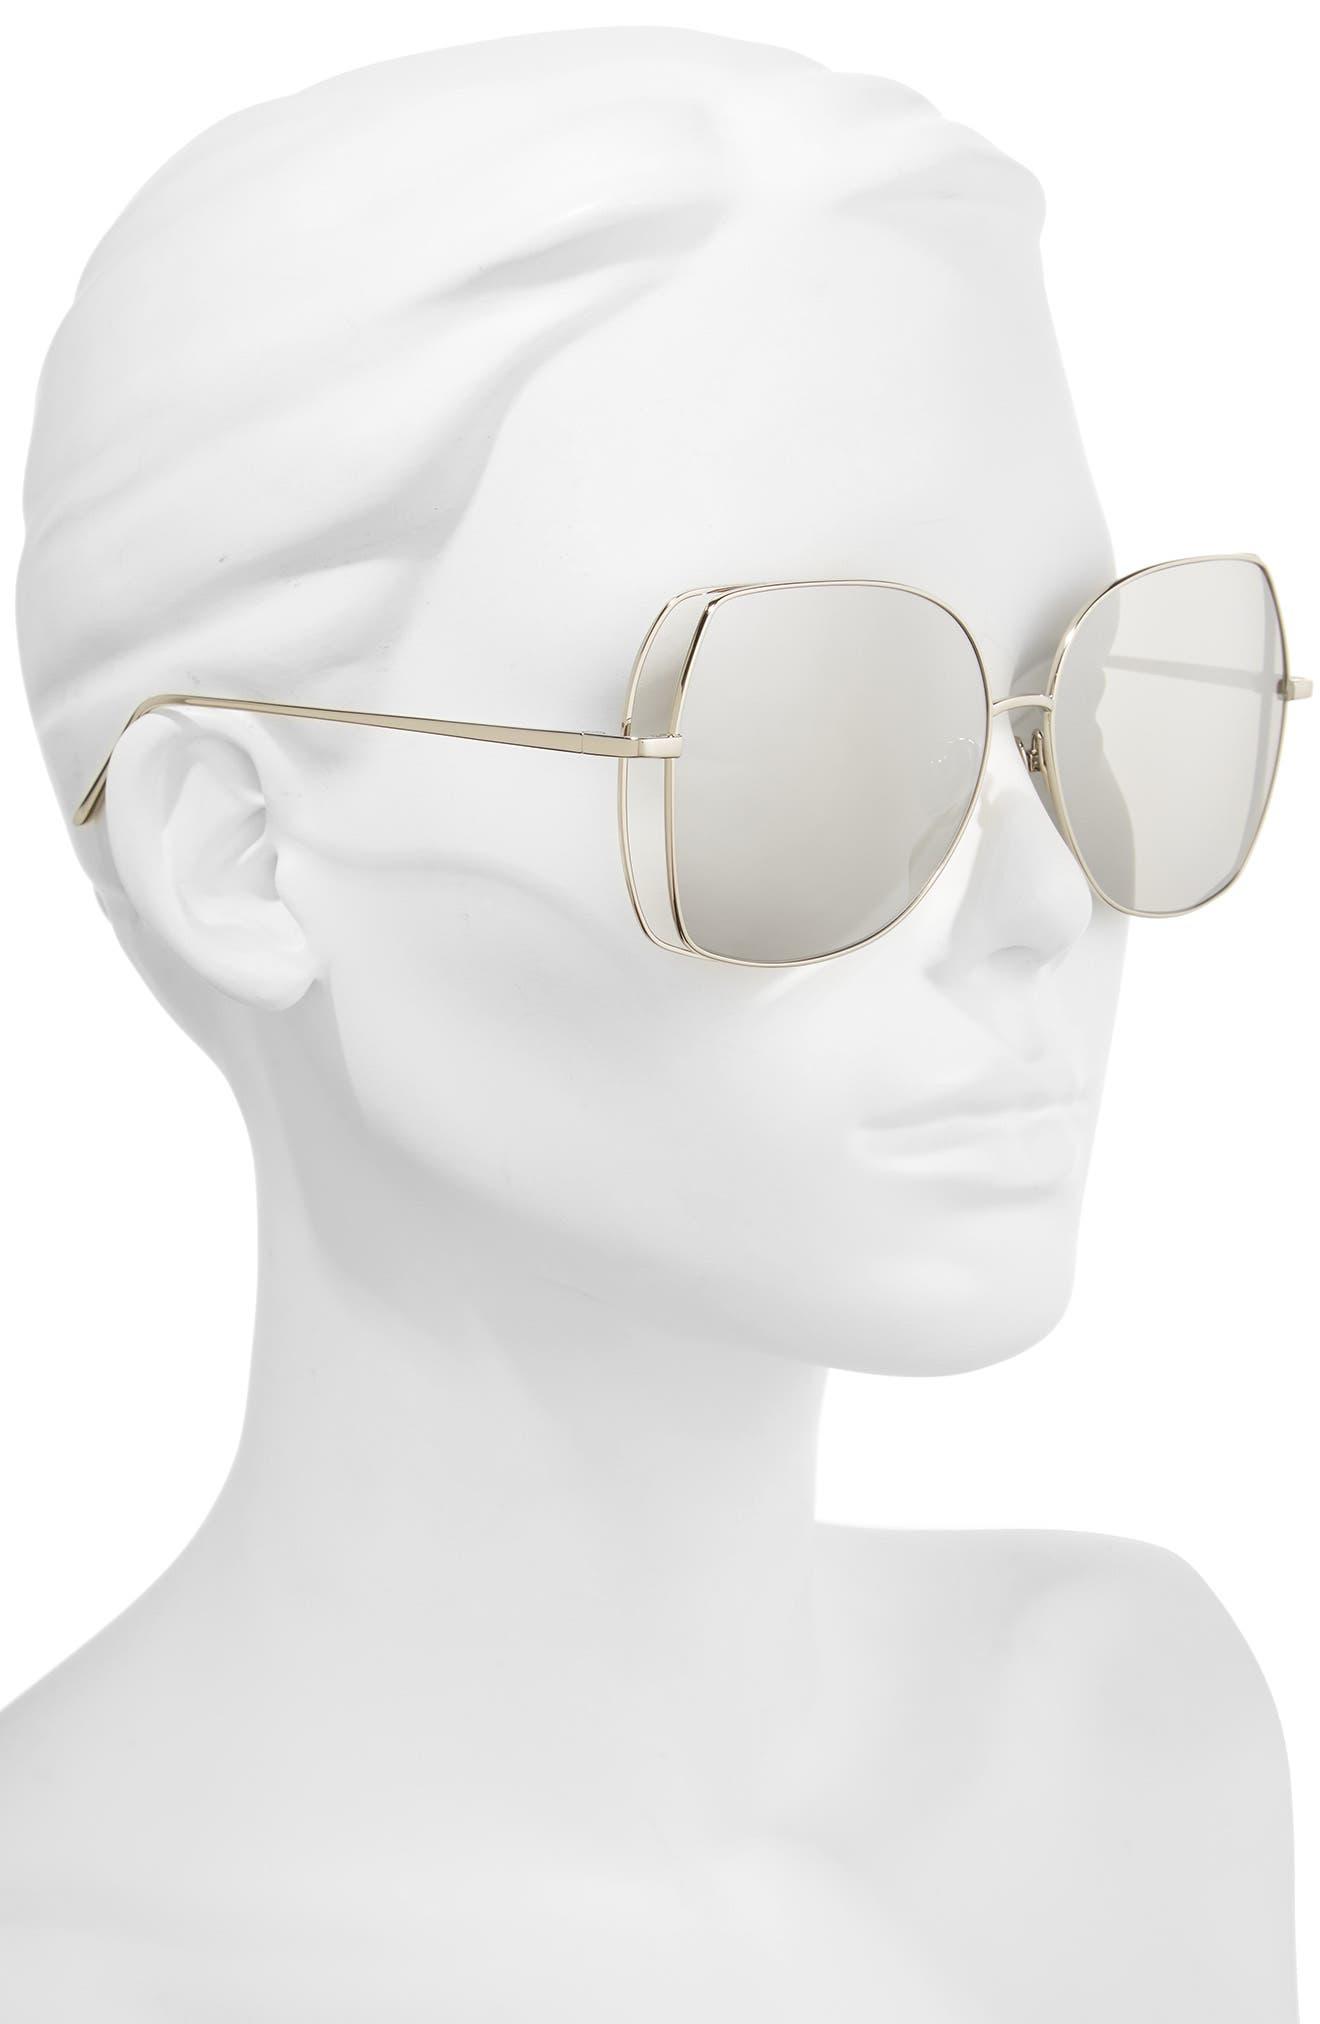 61mm Mirrored 18 Karat White Gold Sunglasses,                             Alternate thumbnail 2, color,